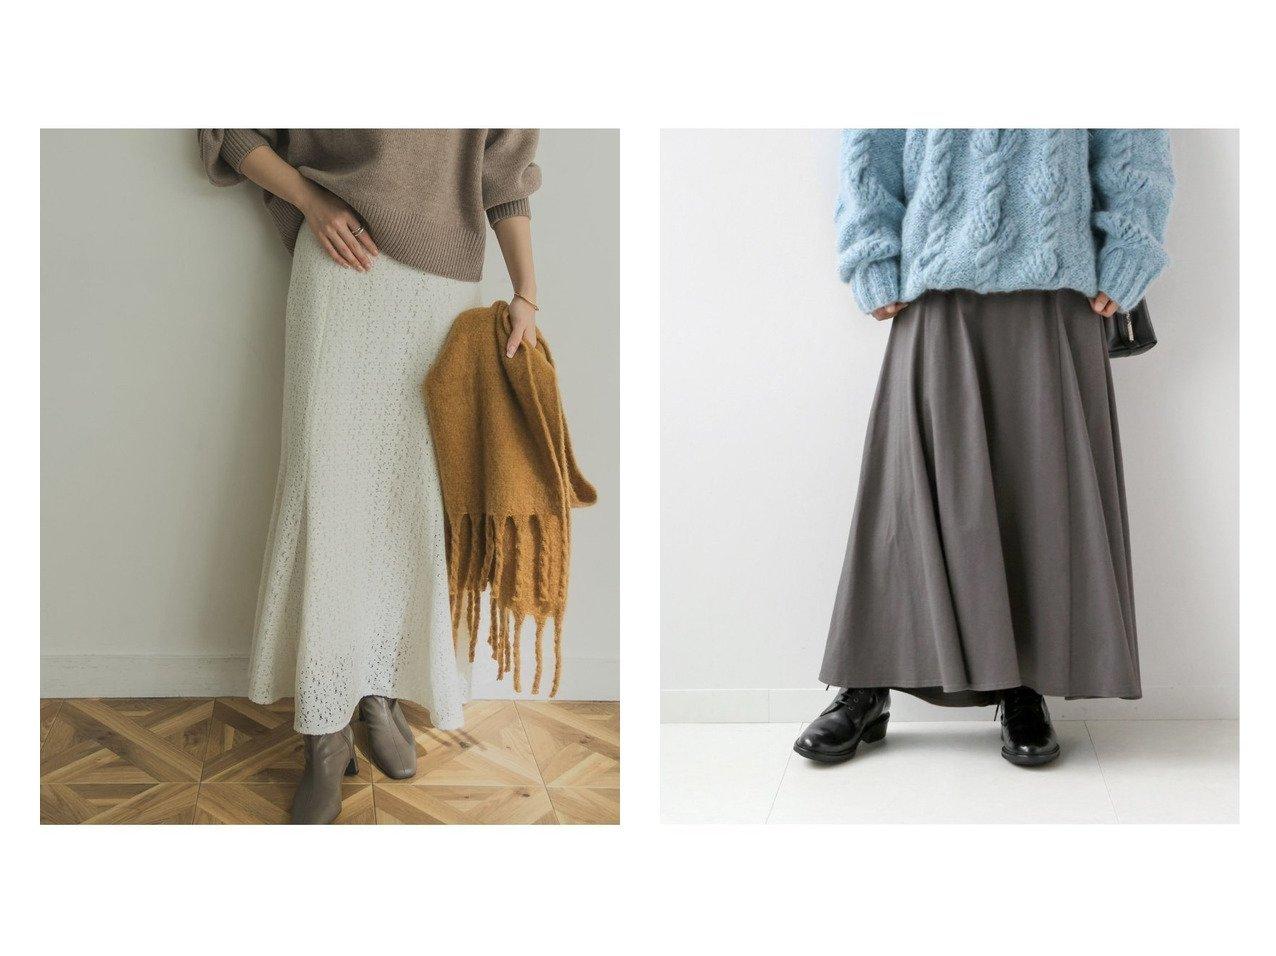 【URBAN RESEARCH/アーバンリサーチ】の起毛レーススカート&【JOURNAL STANDARD relume/ジャーナルスタンダード レリューム】のコットンマーメイドイージースカート スカートのおすすめ!人気、トレンド・レディースファッションの通販 おすすめで人気の流行・トレンド、ファッションの通販商品 メンズファッション・キッズファッション・インテリア・家具・レディースファッション・服の通販 founy(ファニー) https://founy.com/ ファッション Fashion レディースファッション WOMEN スカート Skirt ロングスカート Long Skirt シンプル スタンダード チュニック バランス フォルム フレア ポケット マーメイド レース A/W 秋冬 AW Autumn/Winter / FW Fall-Winter NEW・新作・新着・新入荷 New Arrivals 2020年 2020 2020-2021 秋冬 A/W AW Autumn/Winter / FW Fall-Winter 2020-2021 ロング  ID:crp329100000012427